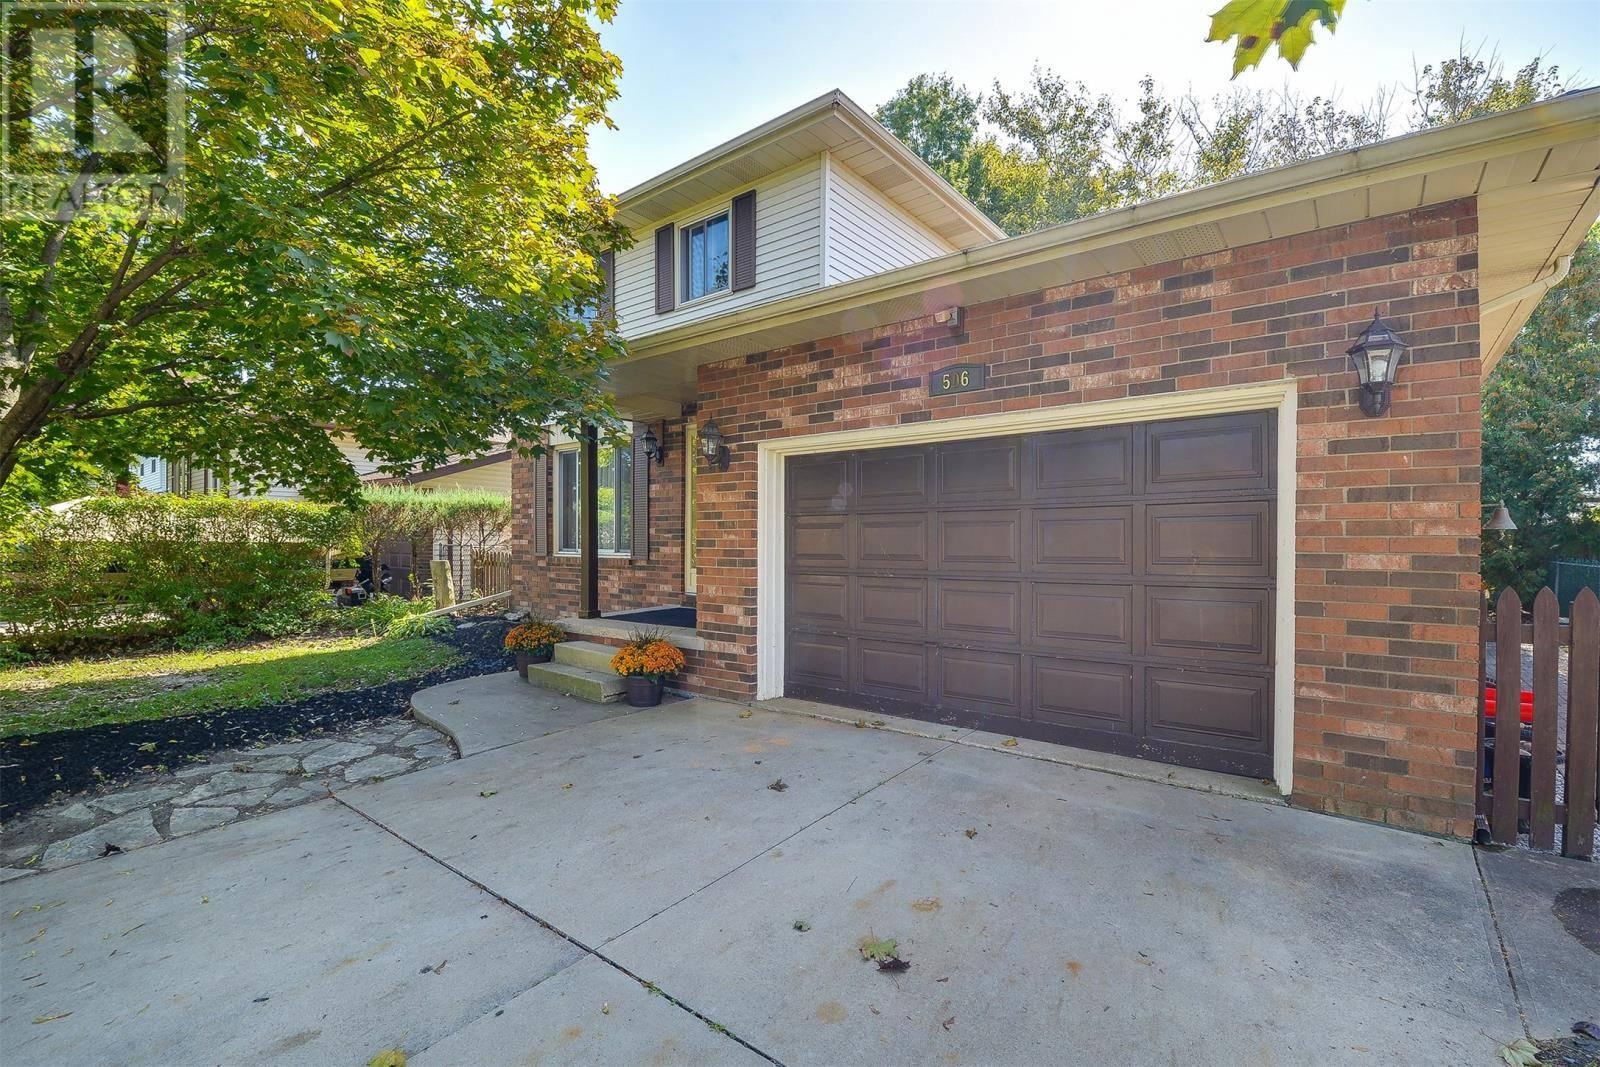 House for sale at 506 Desjardins  Belle River Ontario - MLS: 19027596